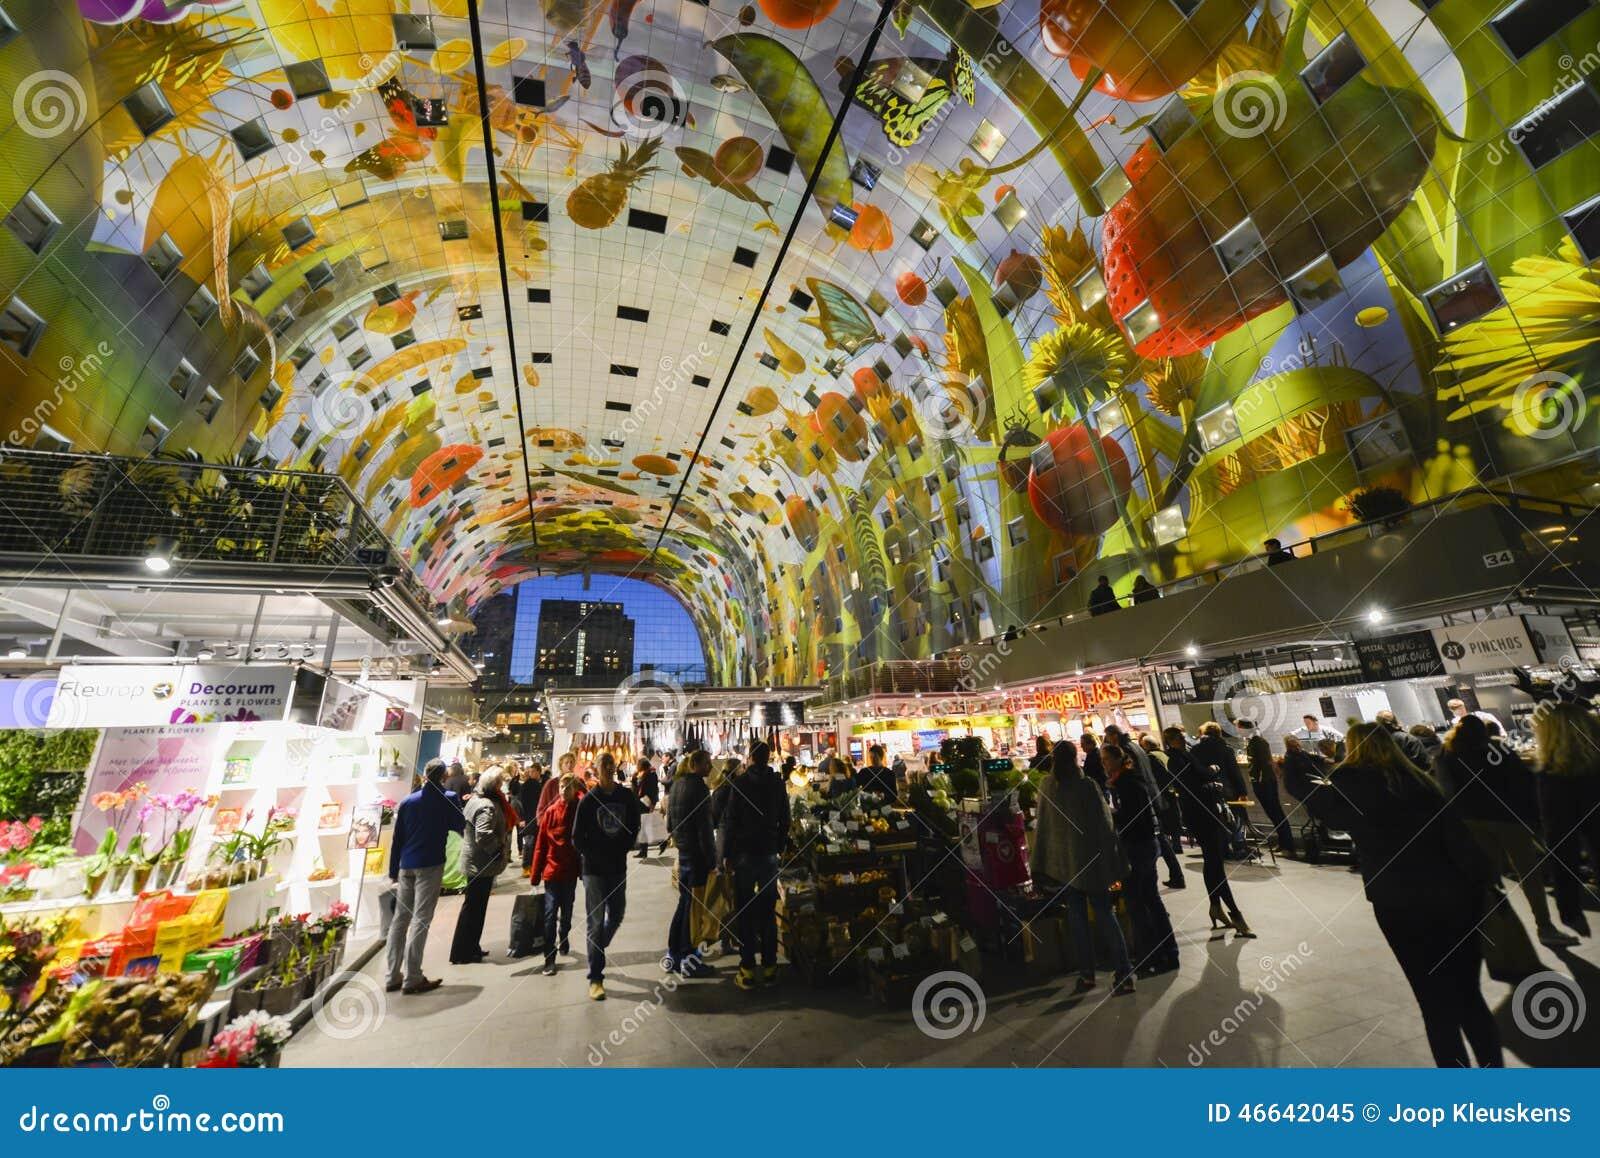 Colorful Market Hall Rotterdam Editorial Image Image